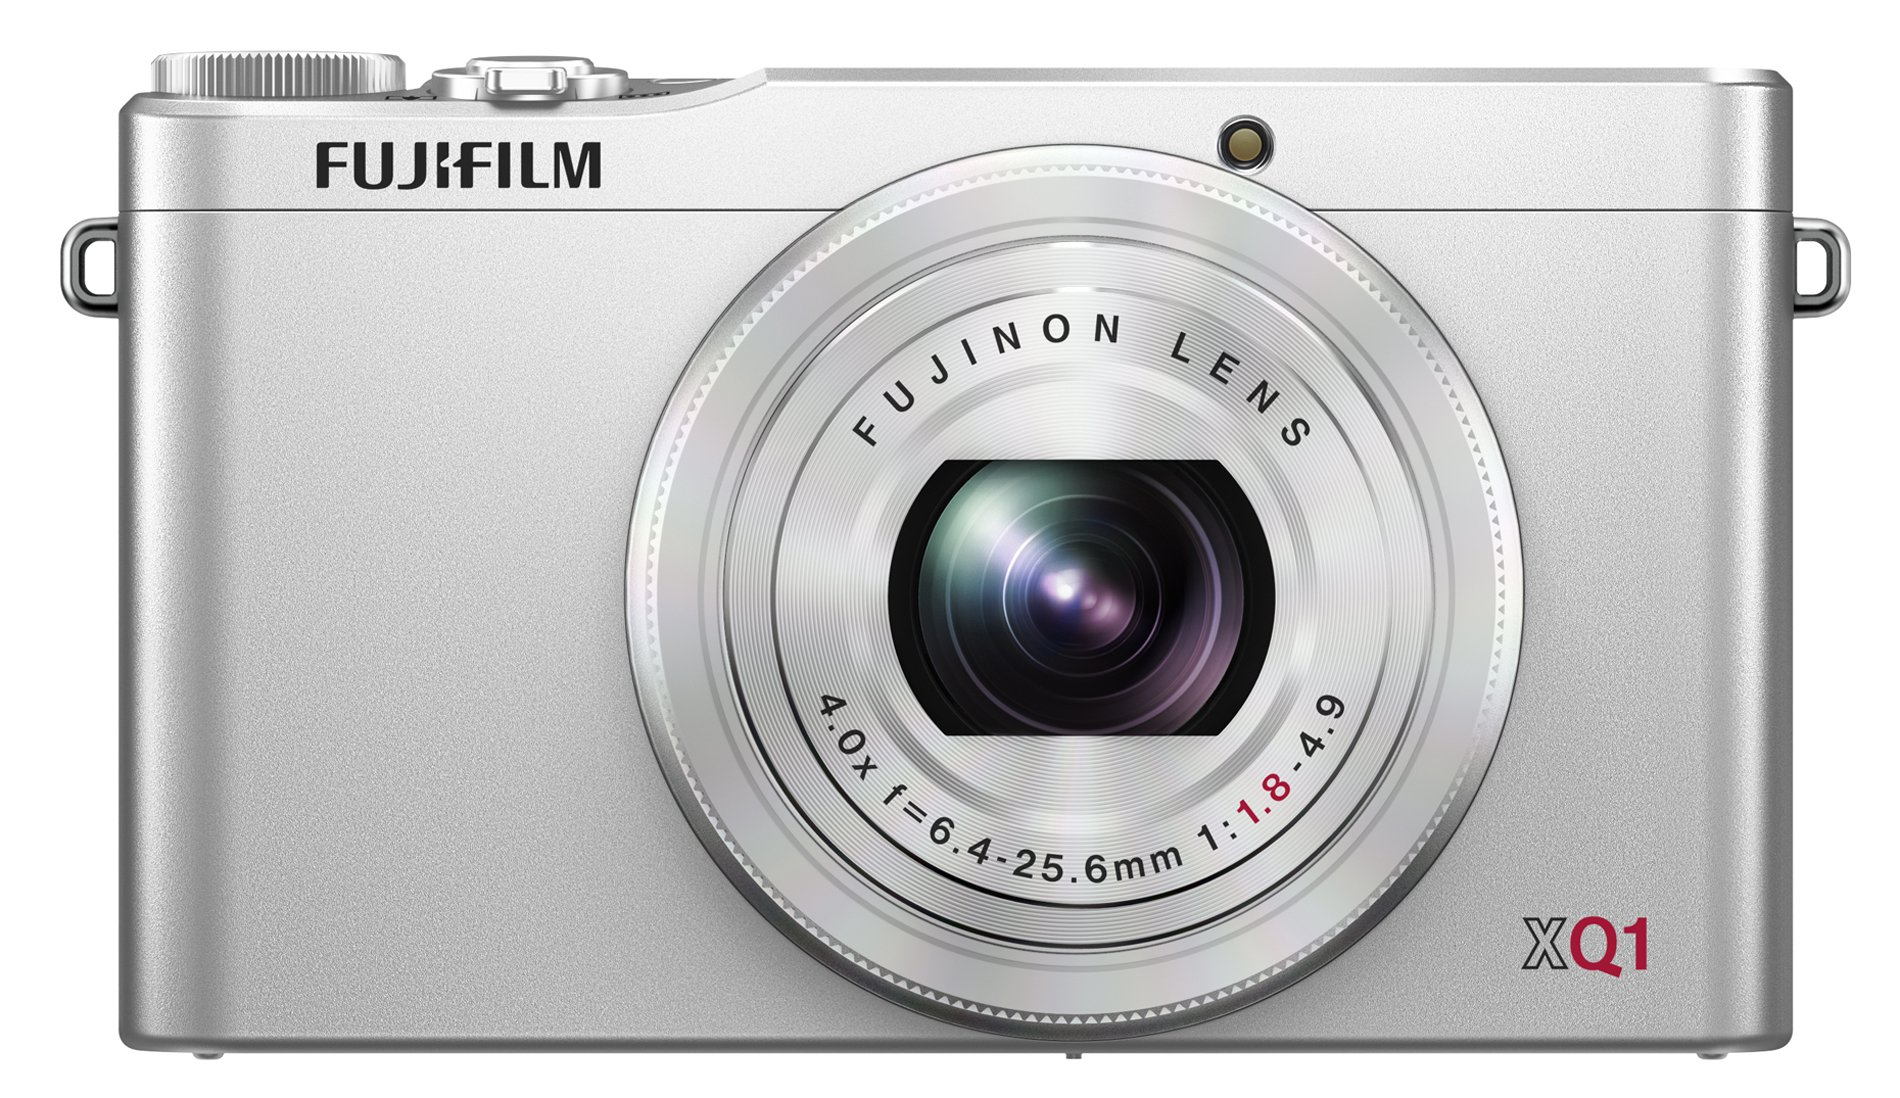 Fujifilm XQ1 12MP Digital Camera with 3.0-Inch LCD (Silver)